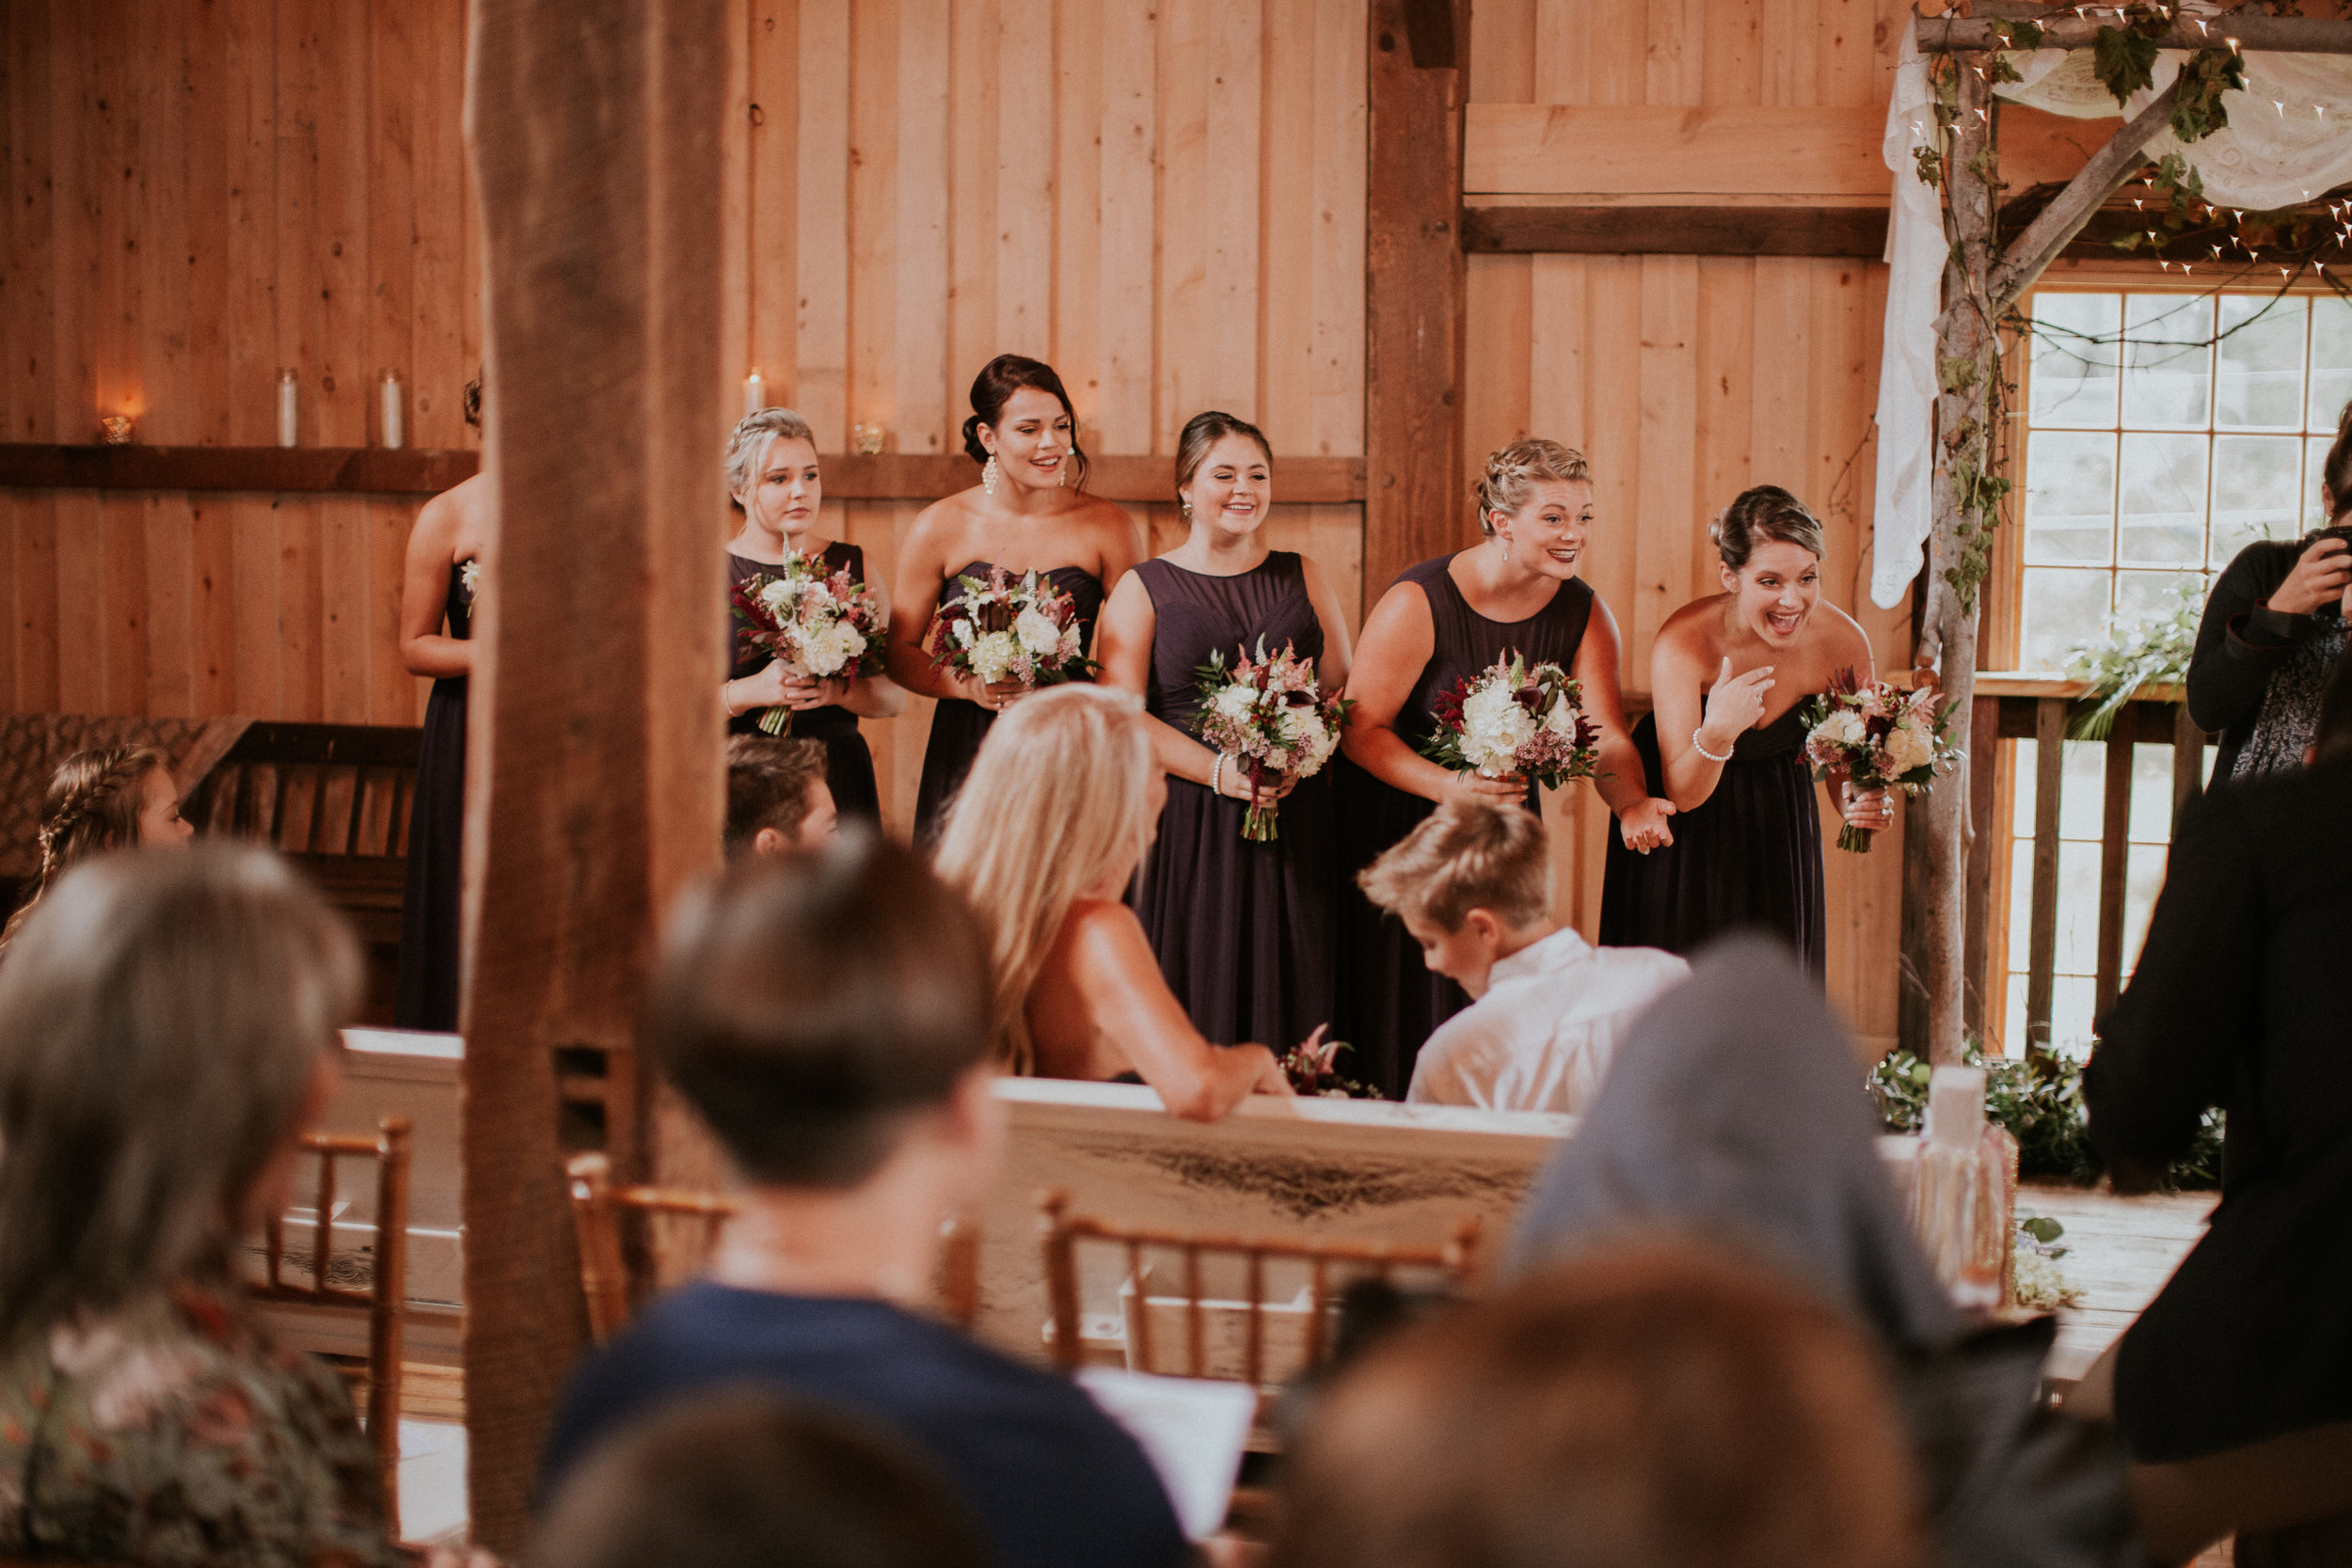 Parker Wedding - ENTERANCE20161001_1039.jpg